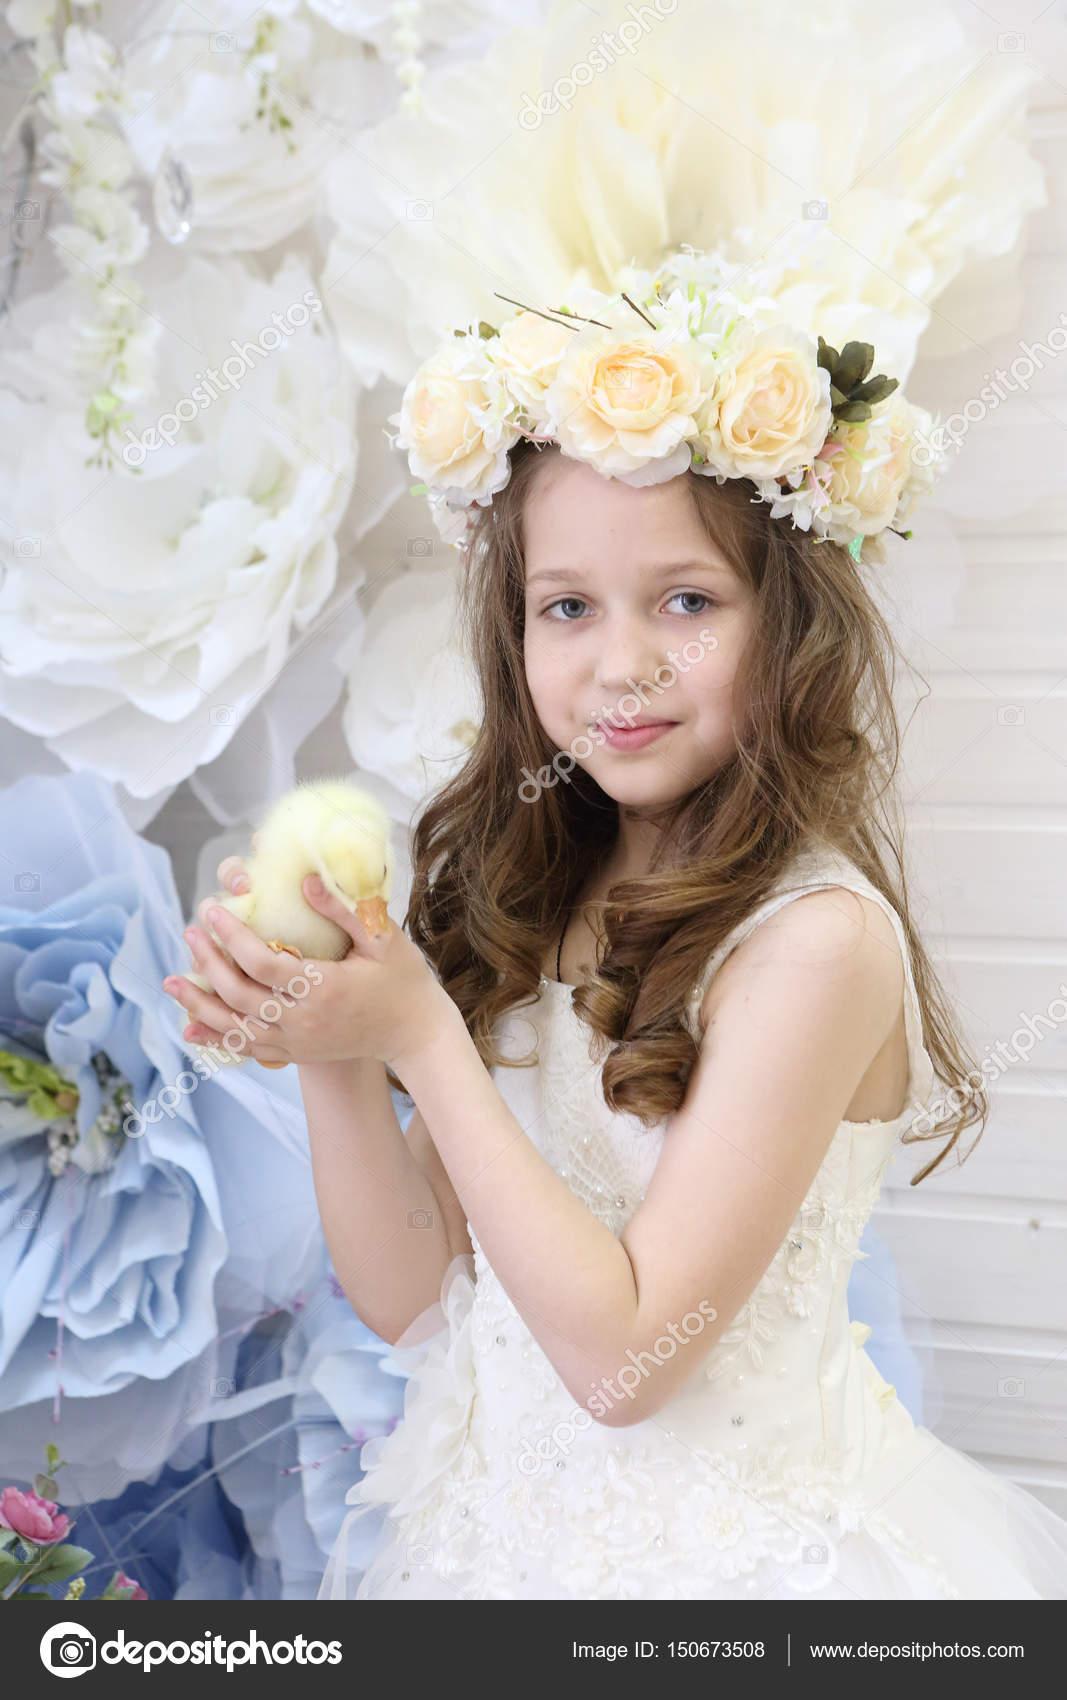 673f54a7a942 Κορίτσι με ένα στεφάνι και ένα λευκό φόρεμα κατέχει μια ζωντανή πάπια–  εικόνα αρχείου